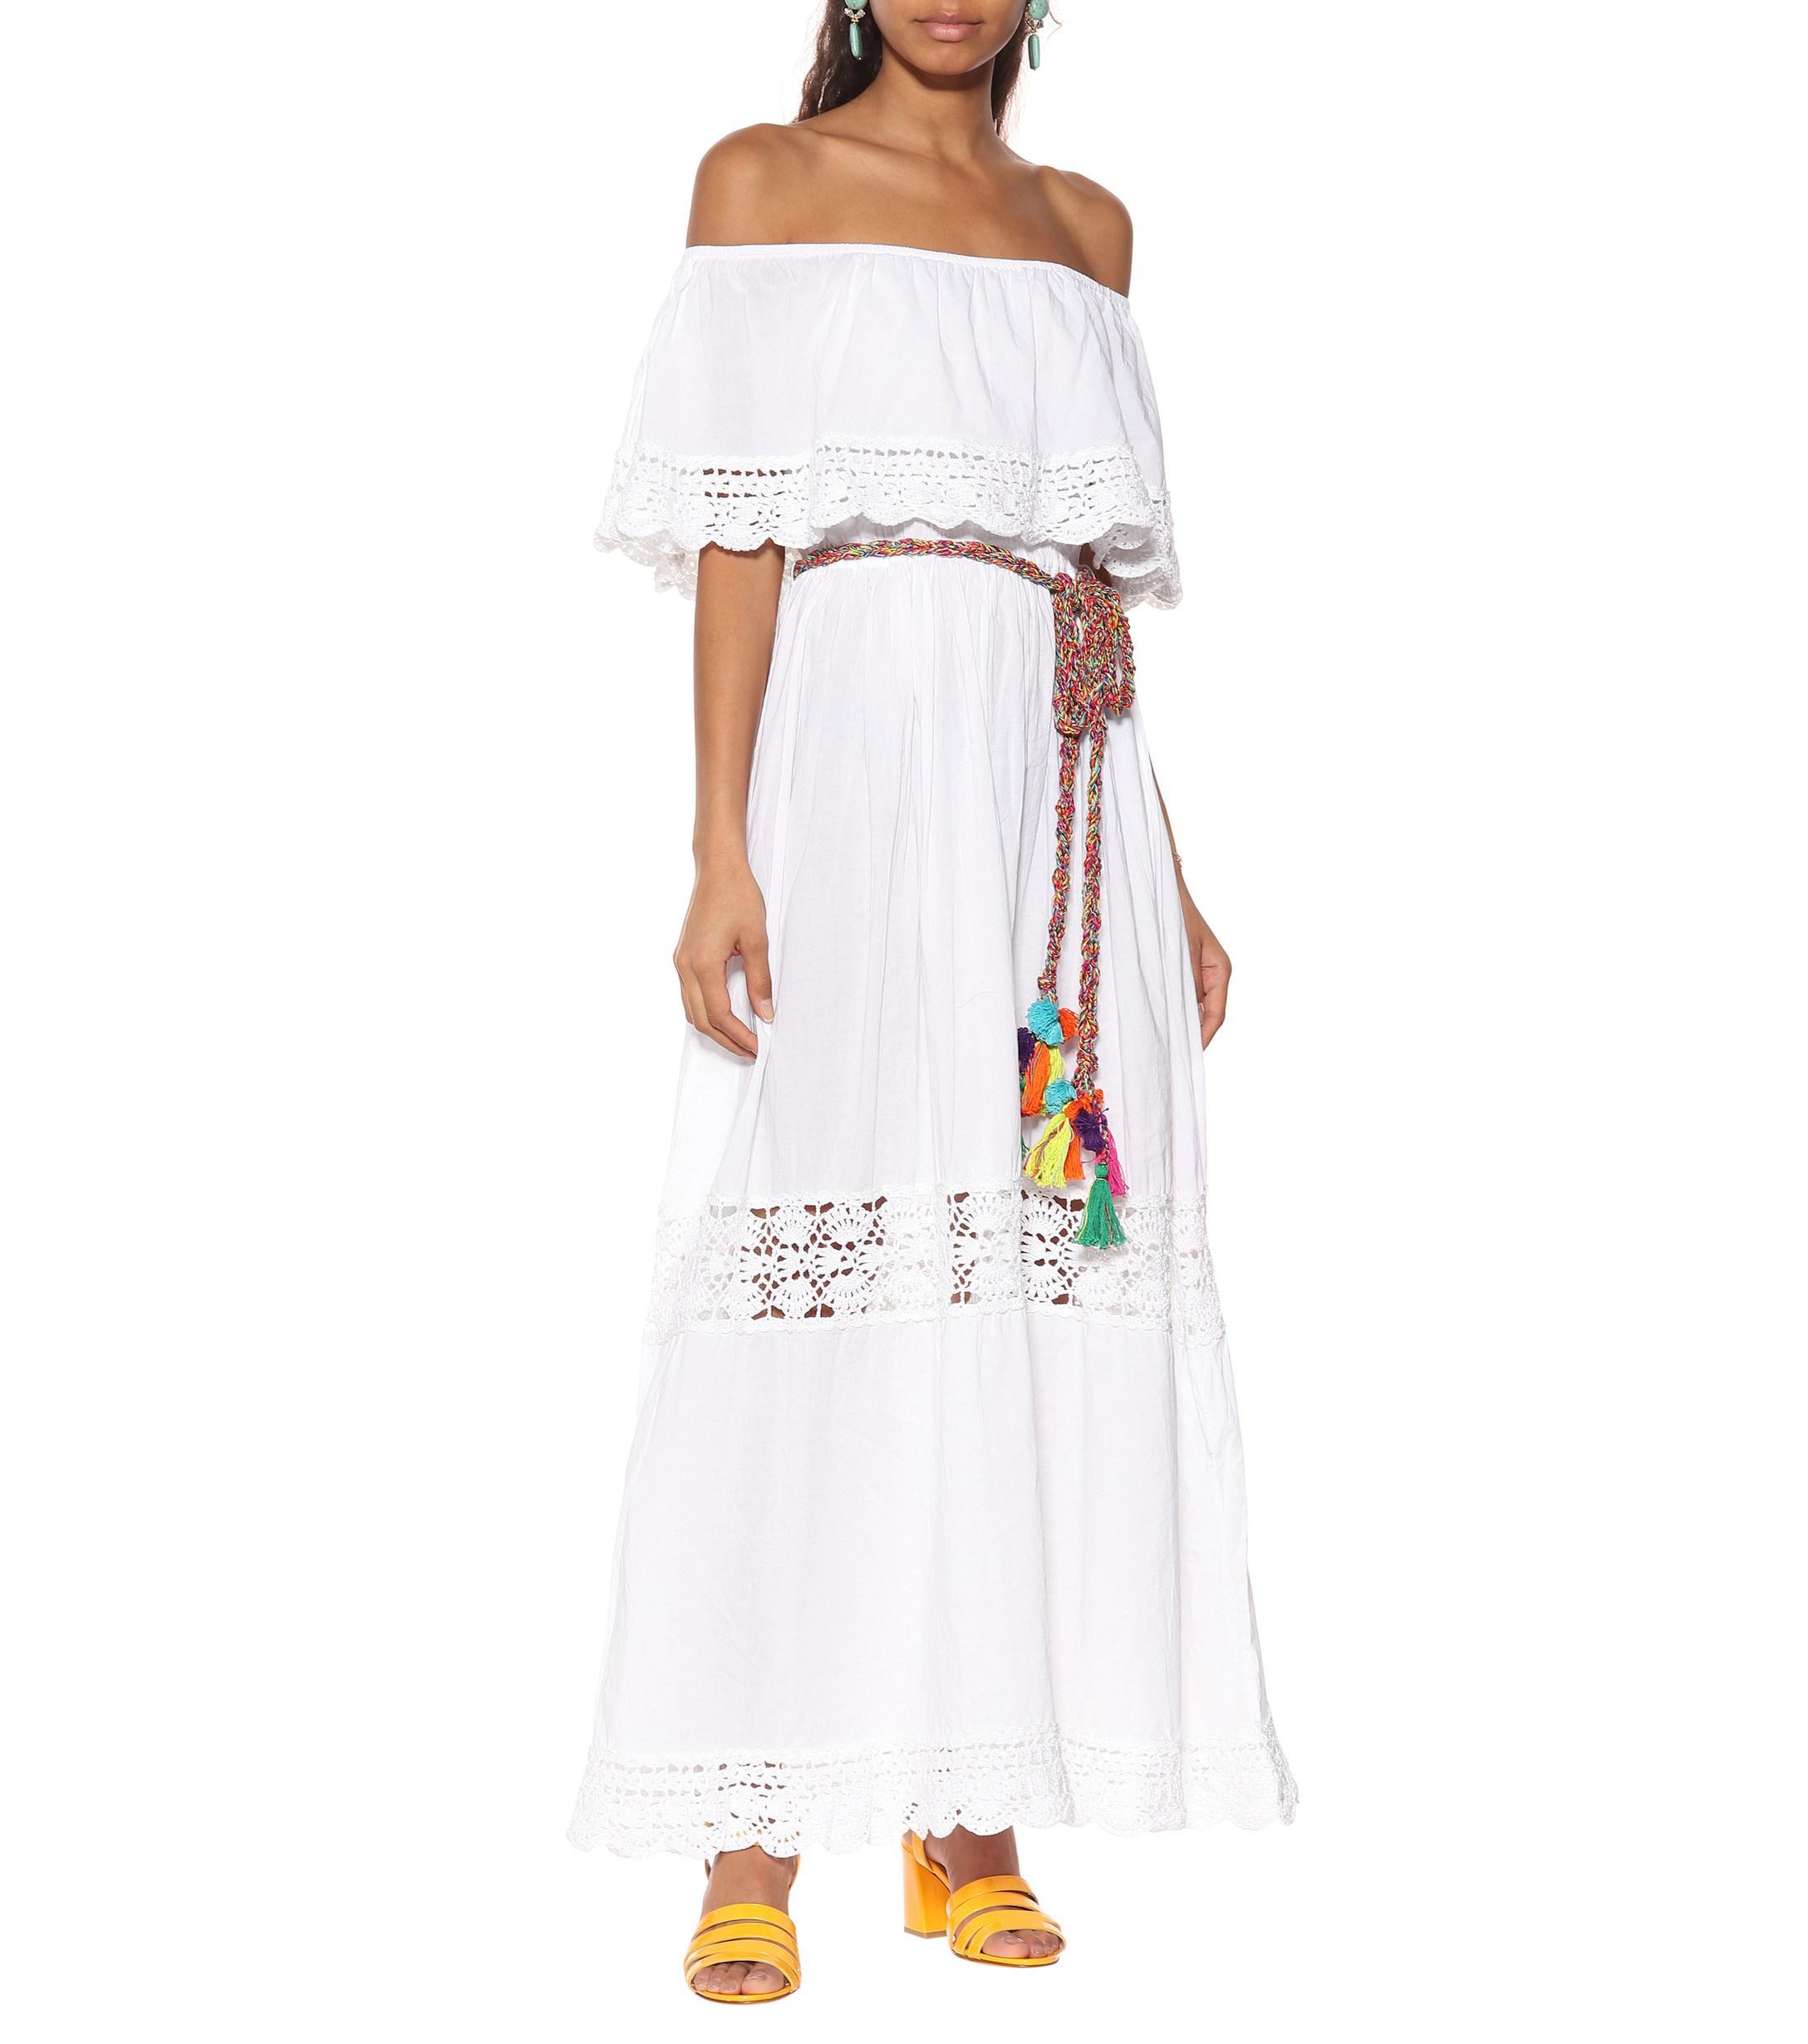 Janessa vestido descubiertos White hombros Lyst con Anna Kosturova pqnEvxwxSt